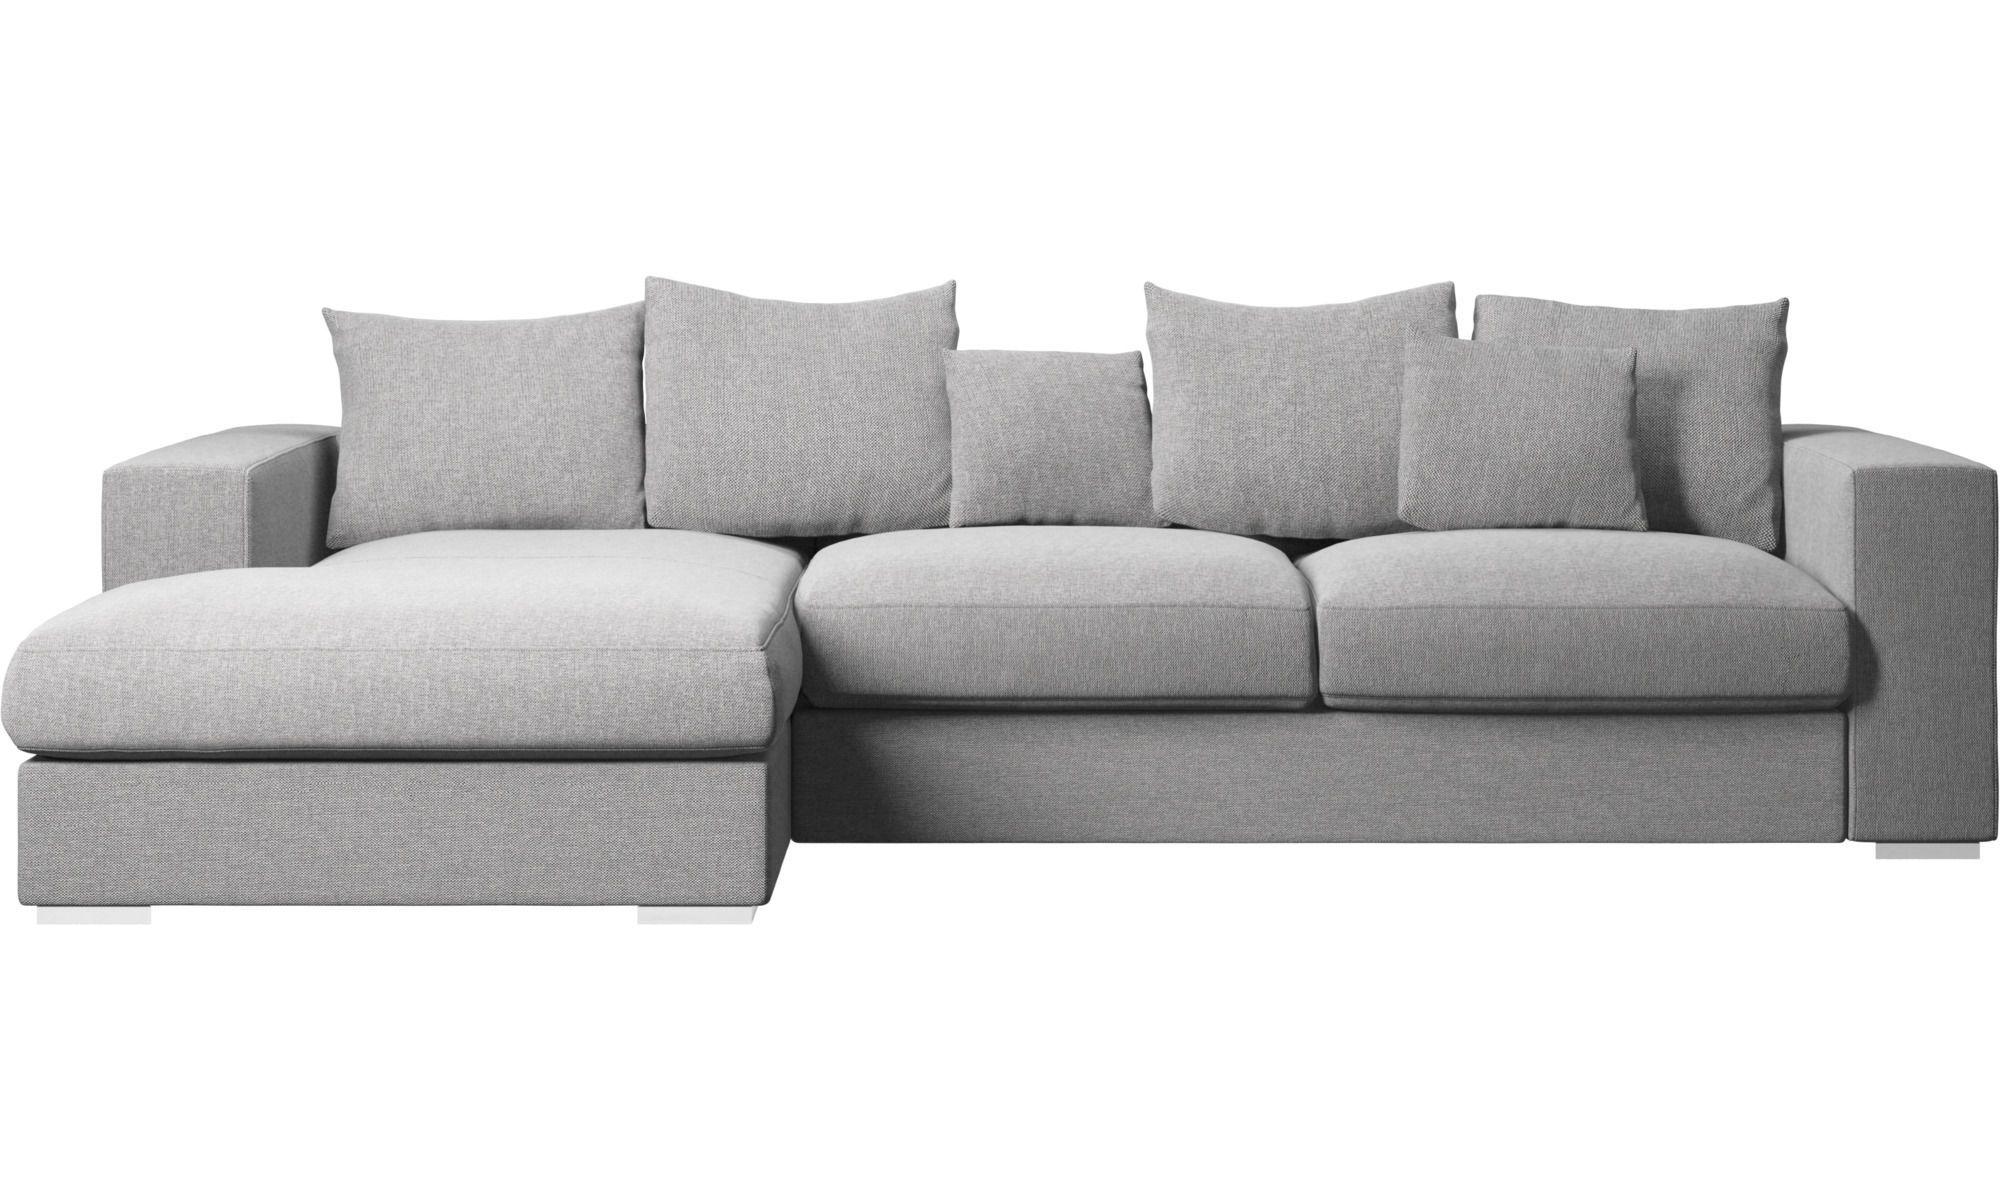 Chaise Lounge Sofas Cenova Sofa With Resting Unit Comfortable Chaise Classic Sofa Sofa